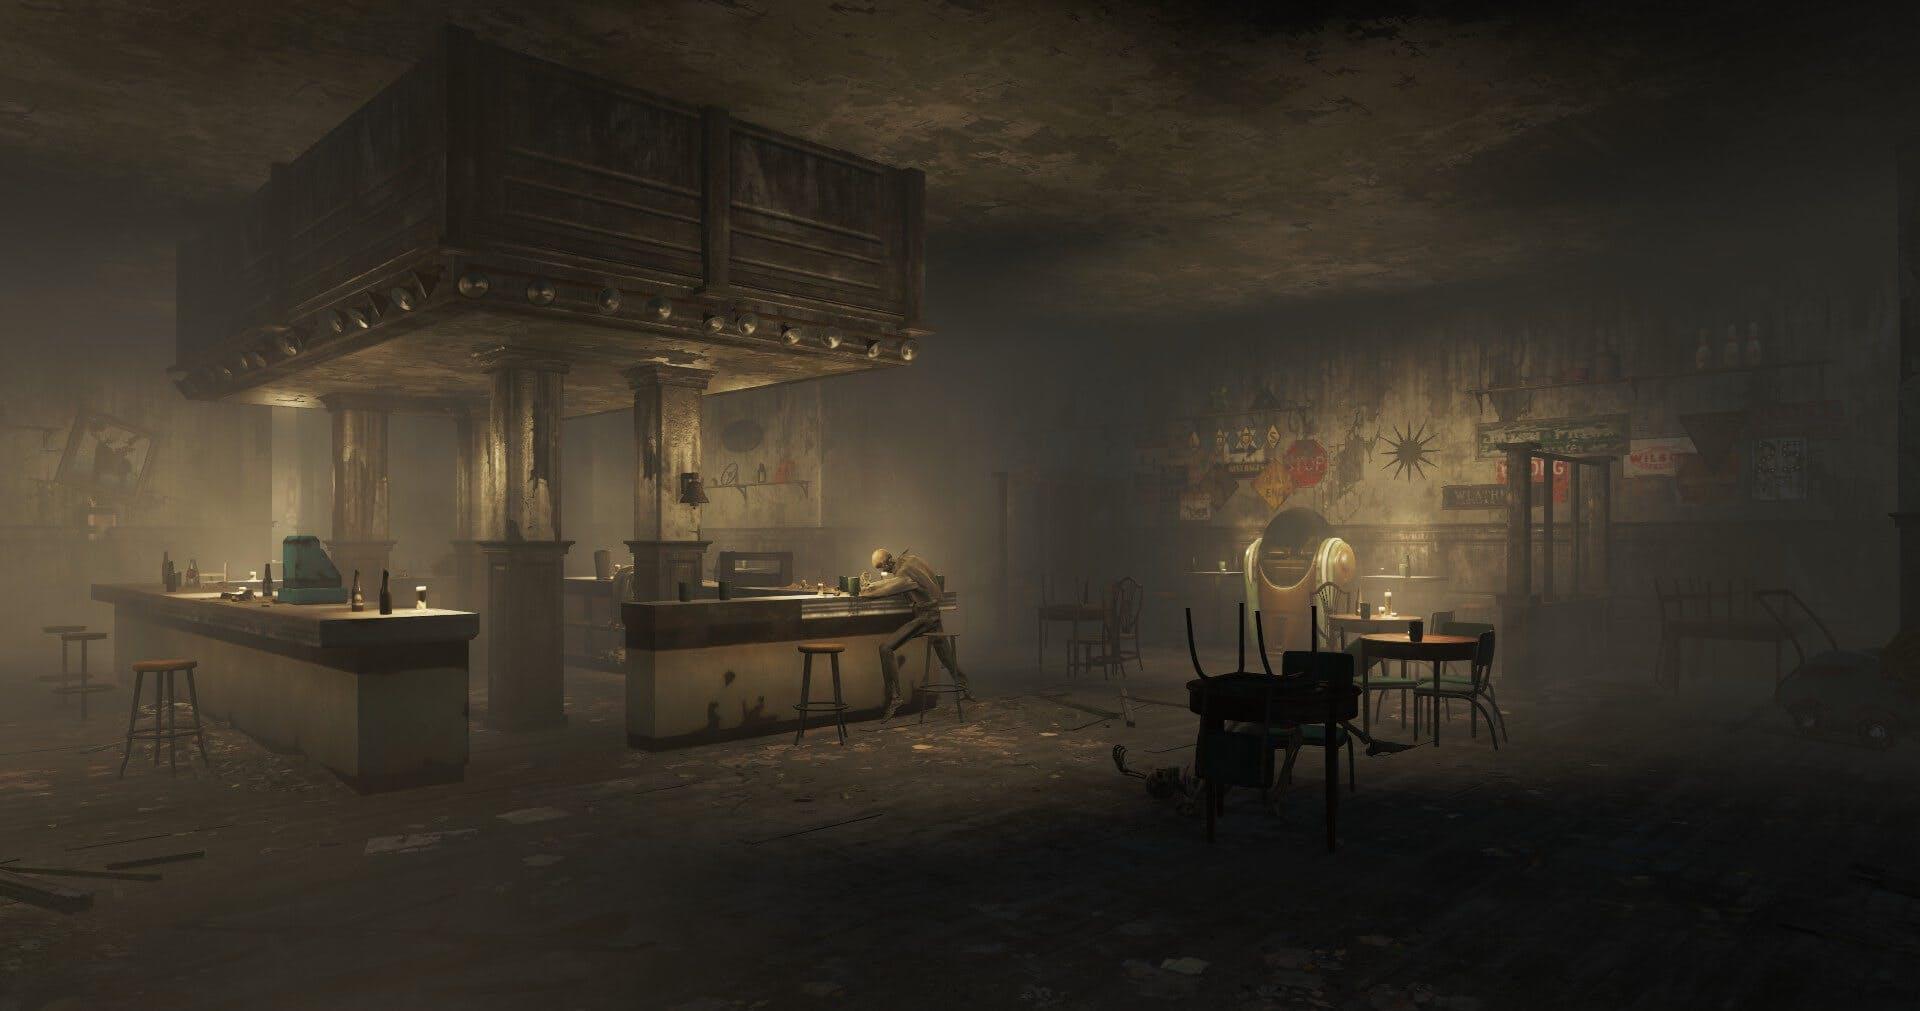 Prost Bar - Fallout 4 secrets